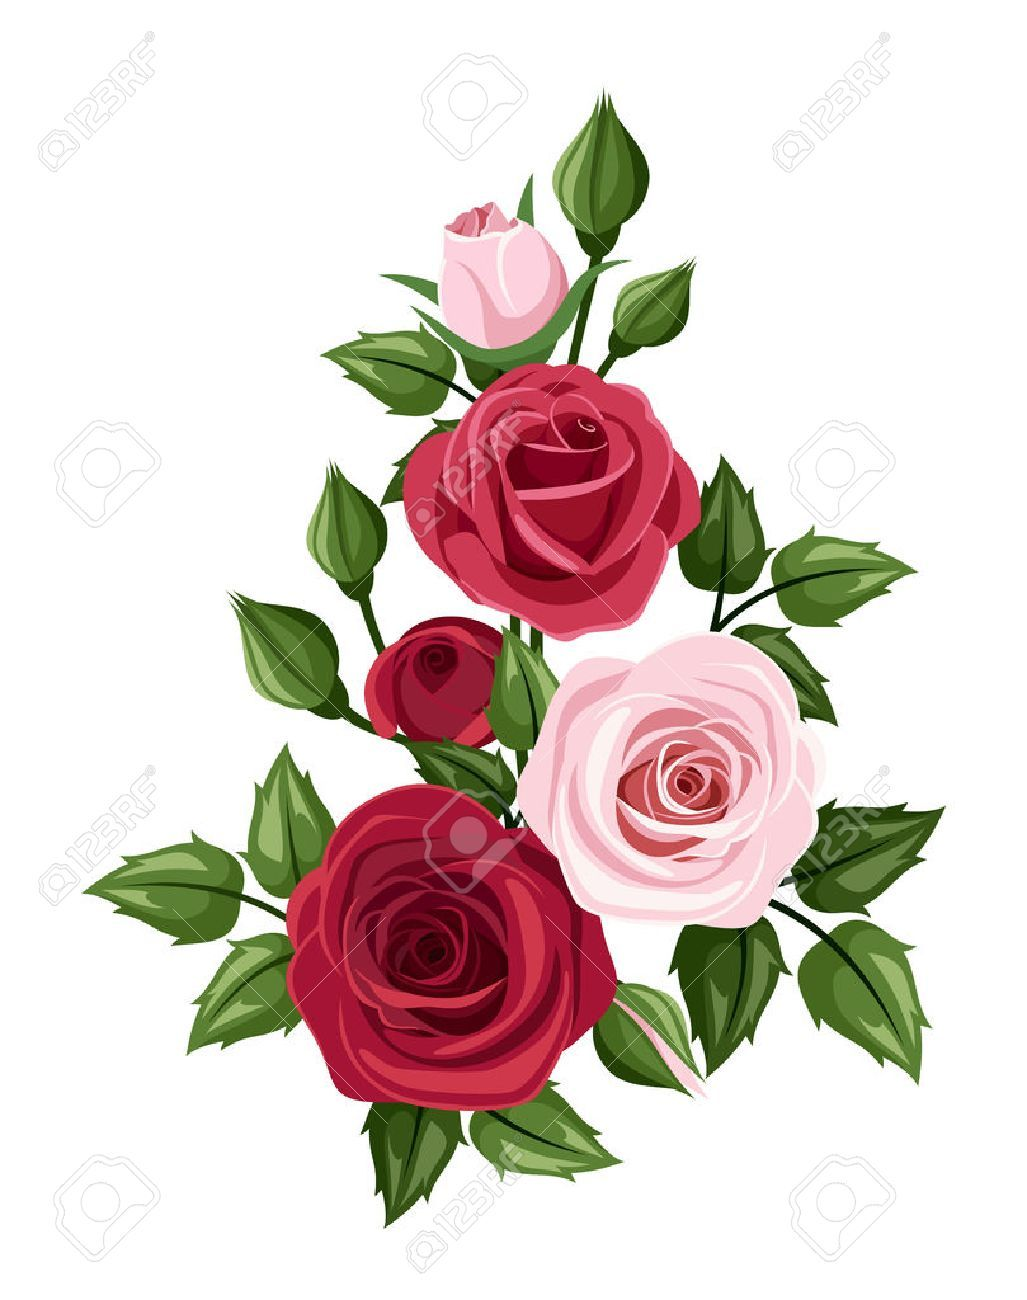 Pink Rose Clipart burgundy 16 1027 X 1300